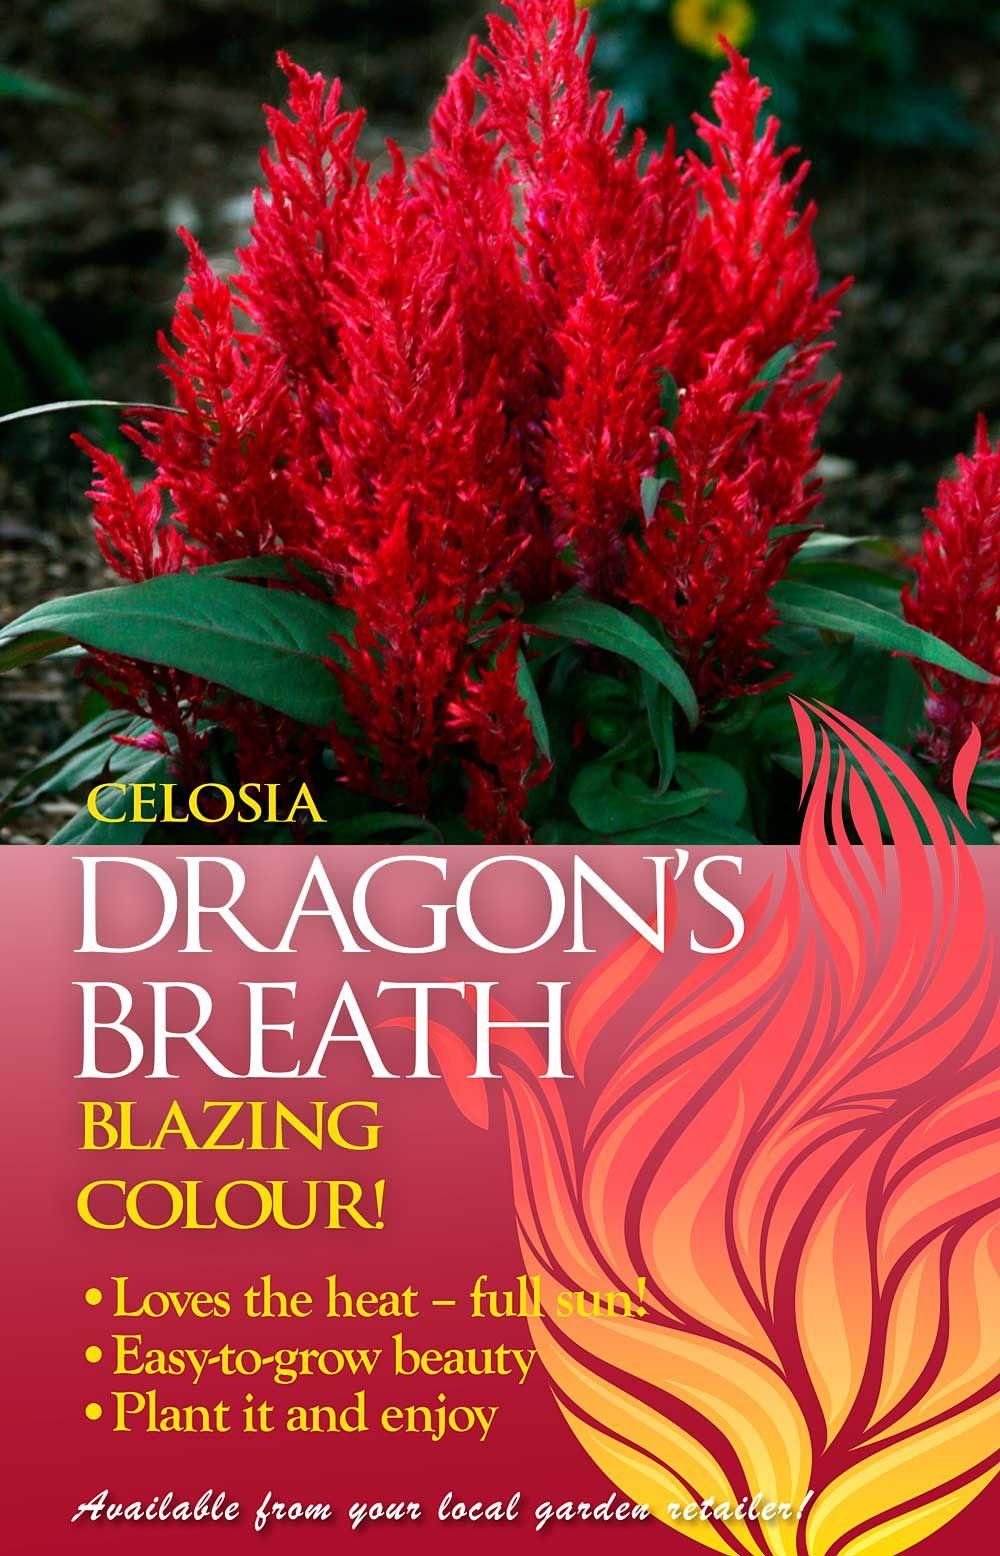 Celosia Dragons Breath Advert Dragons Breath Dragons Breath Plant Garden Plants Vegetable